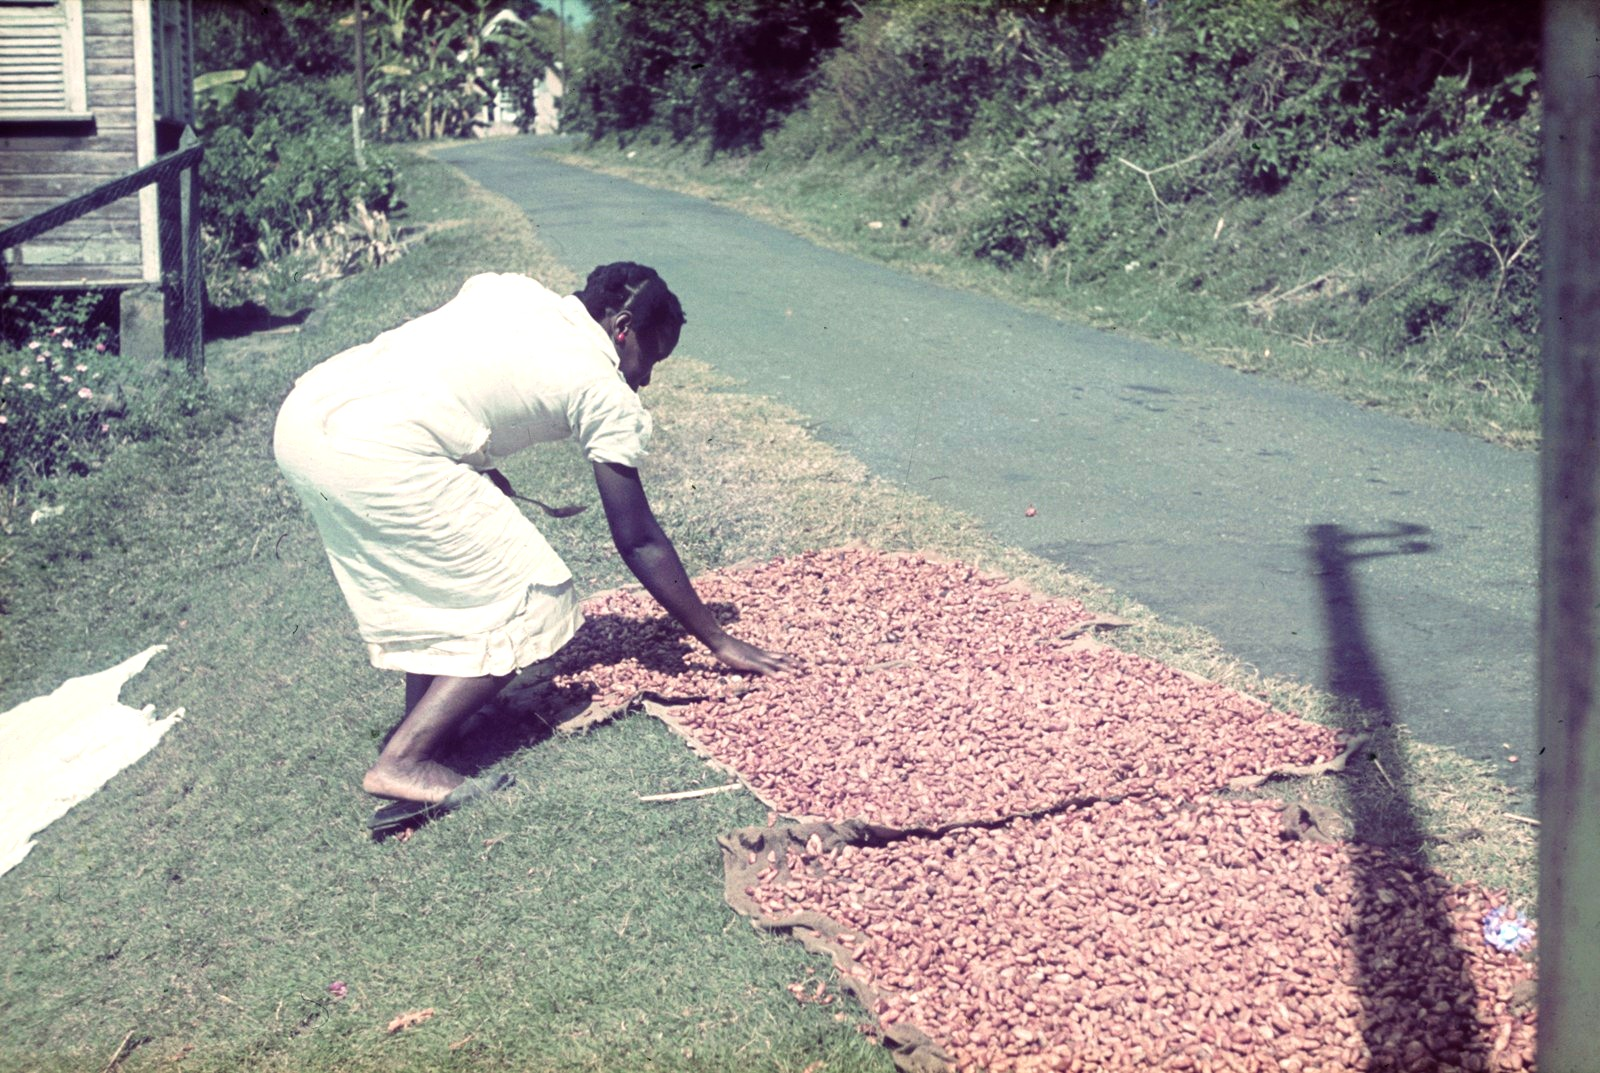 Гренада. Женщина, выложившая для просушки какао-бобы